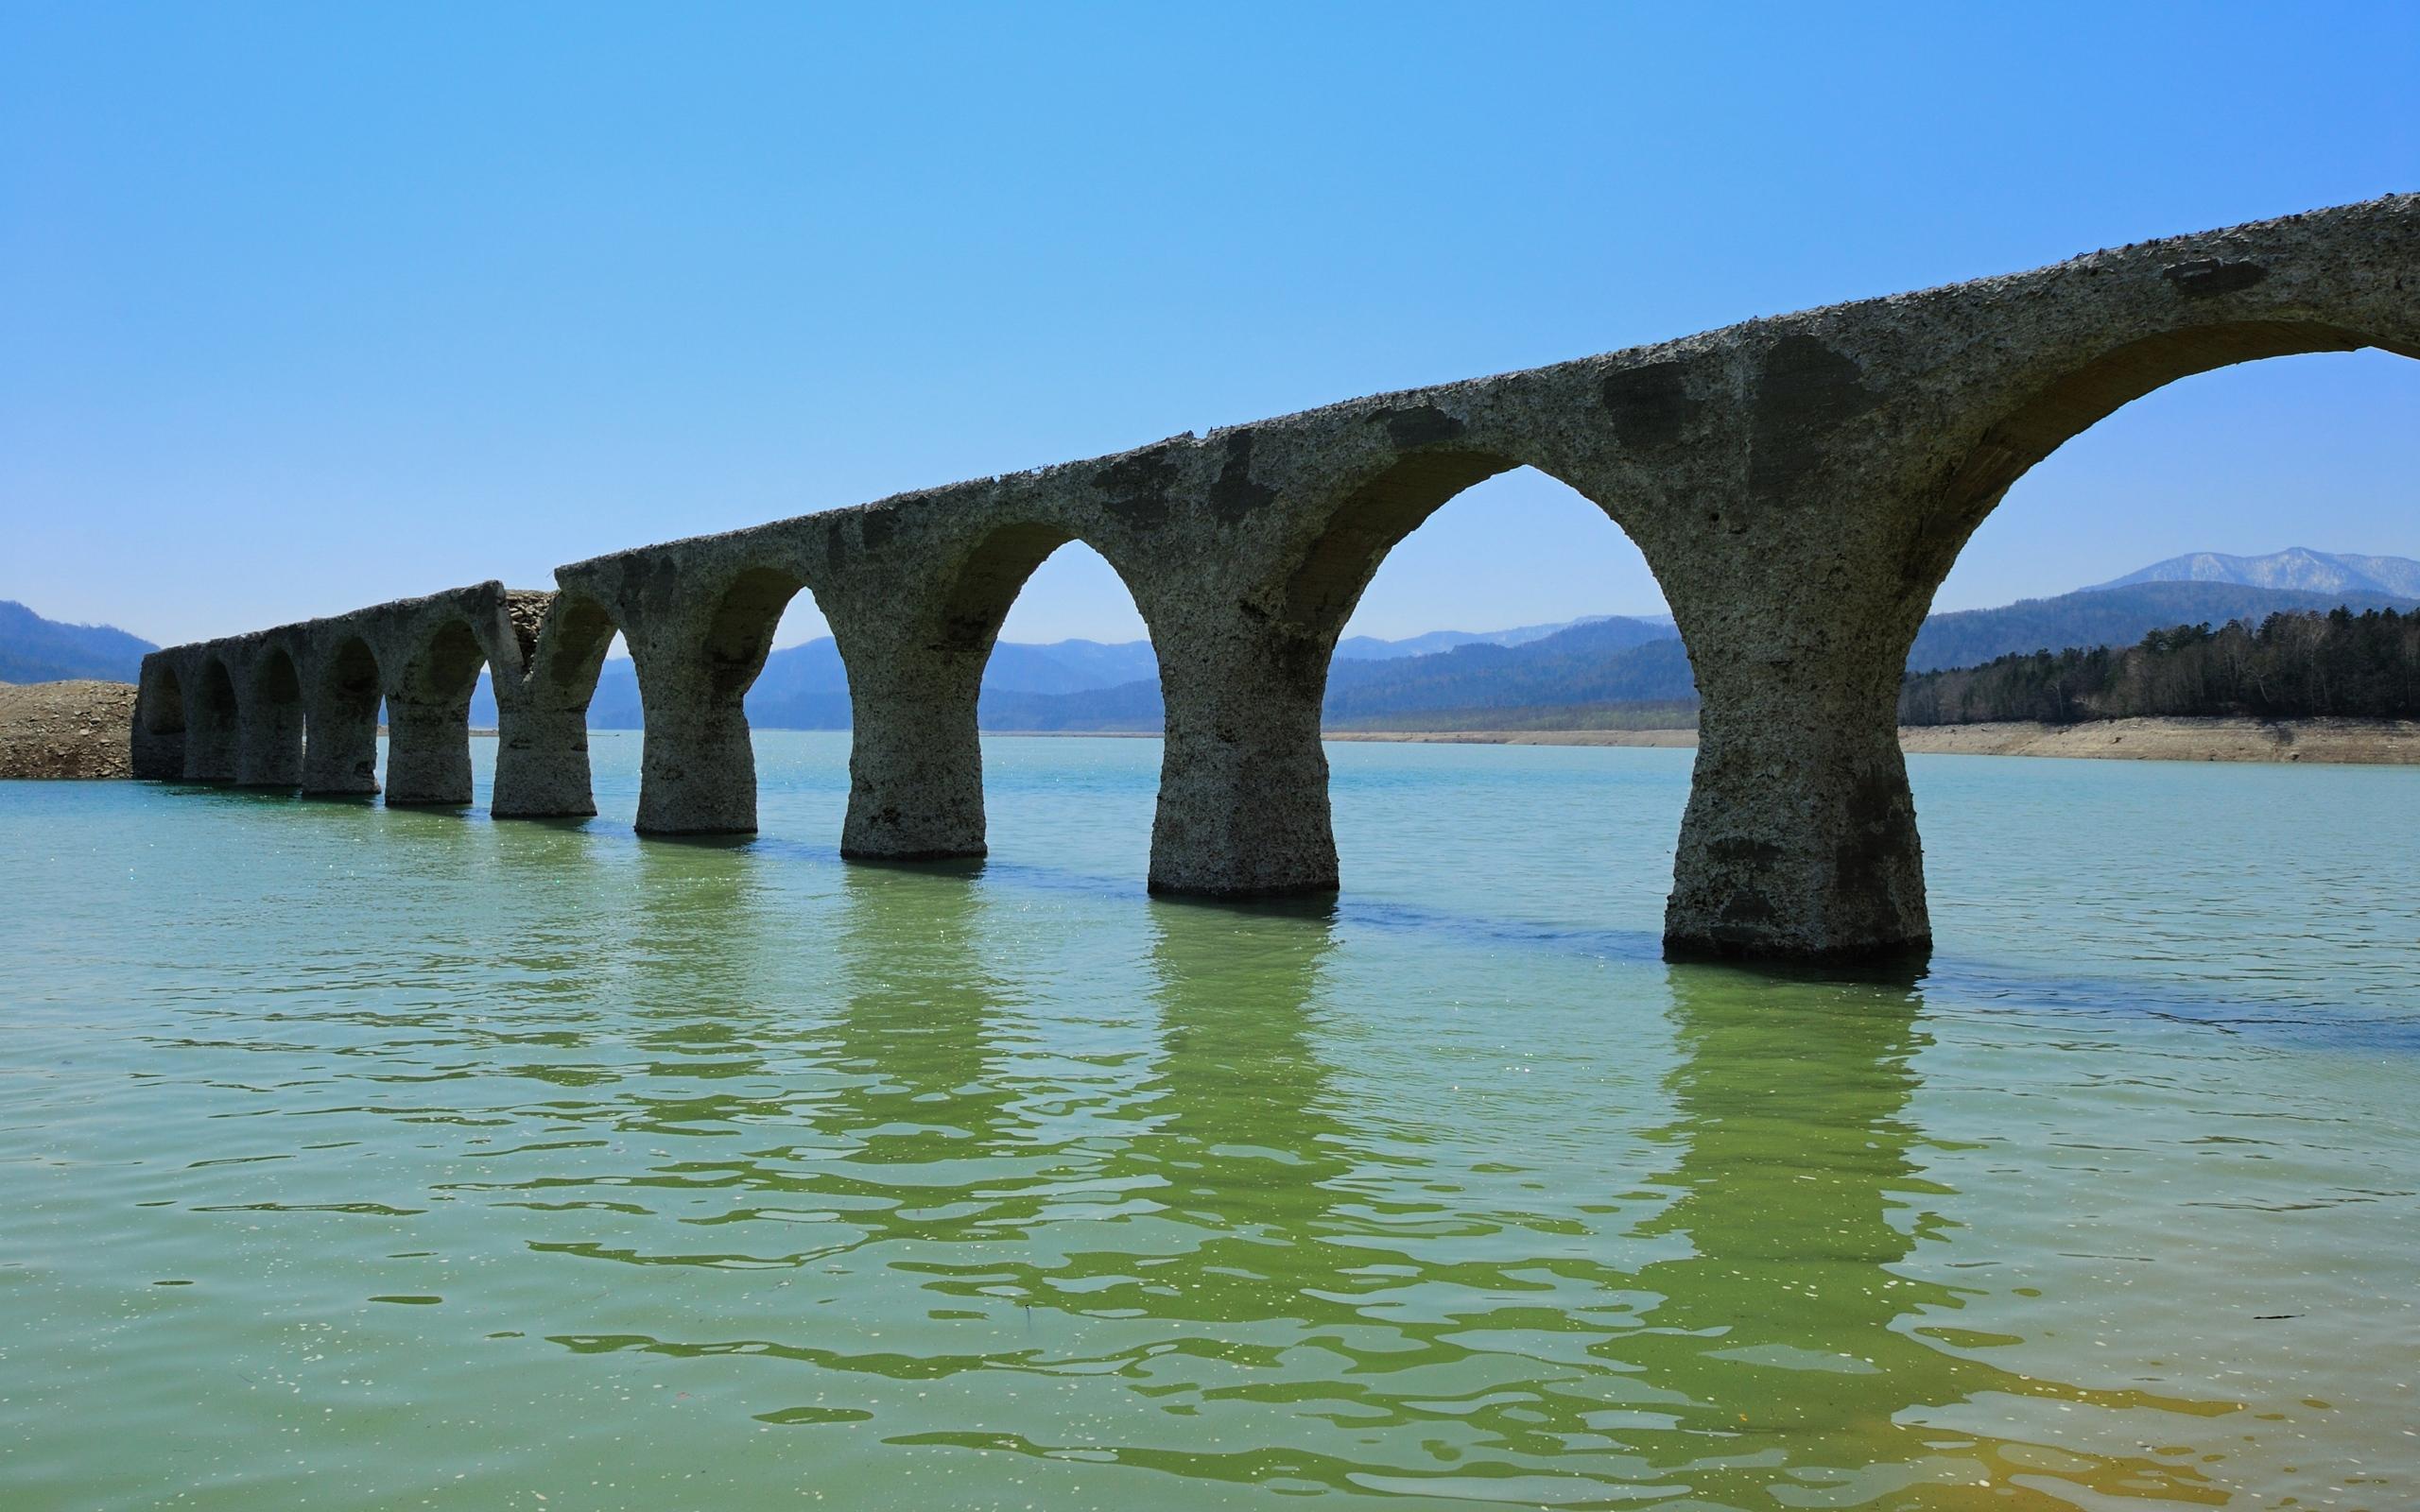 Old bridge / 2560 x 1600 / Other / Photography | MIRIADNA.COM